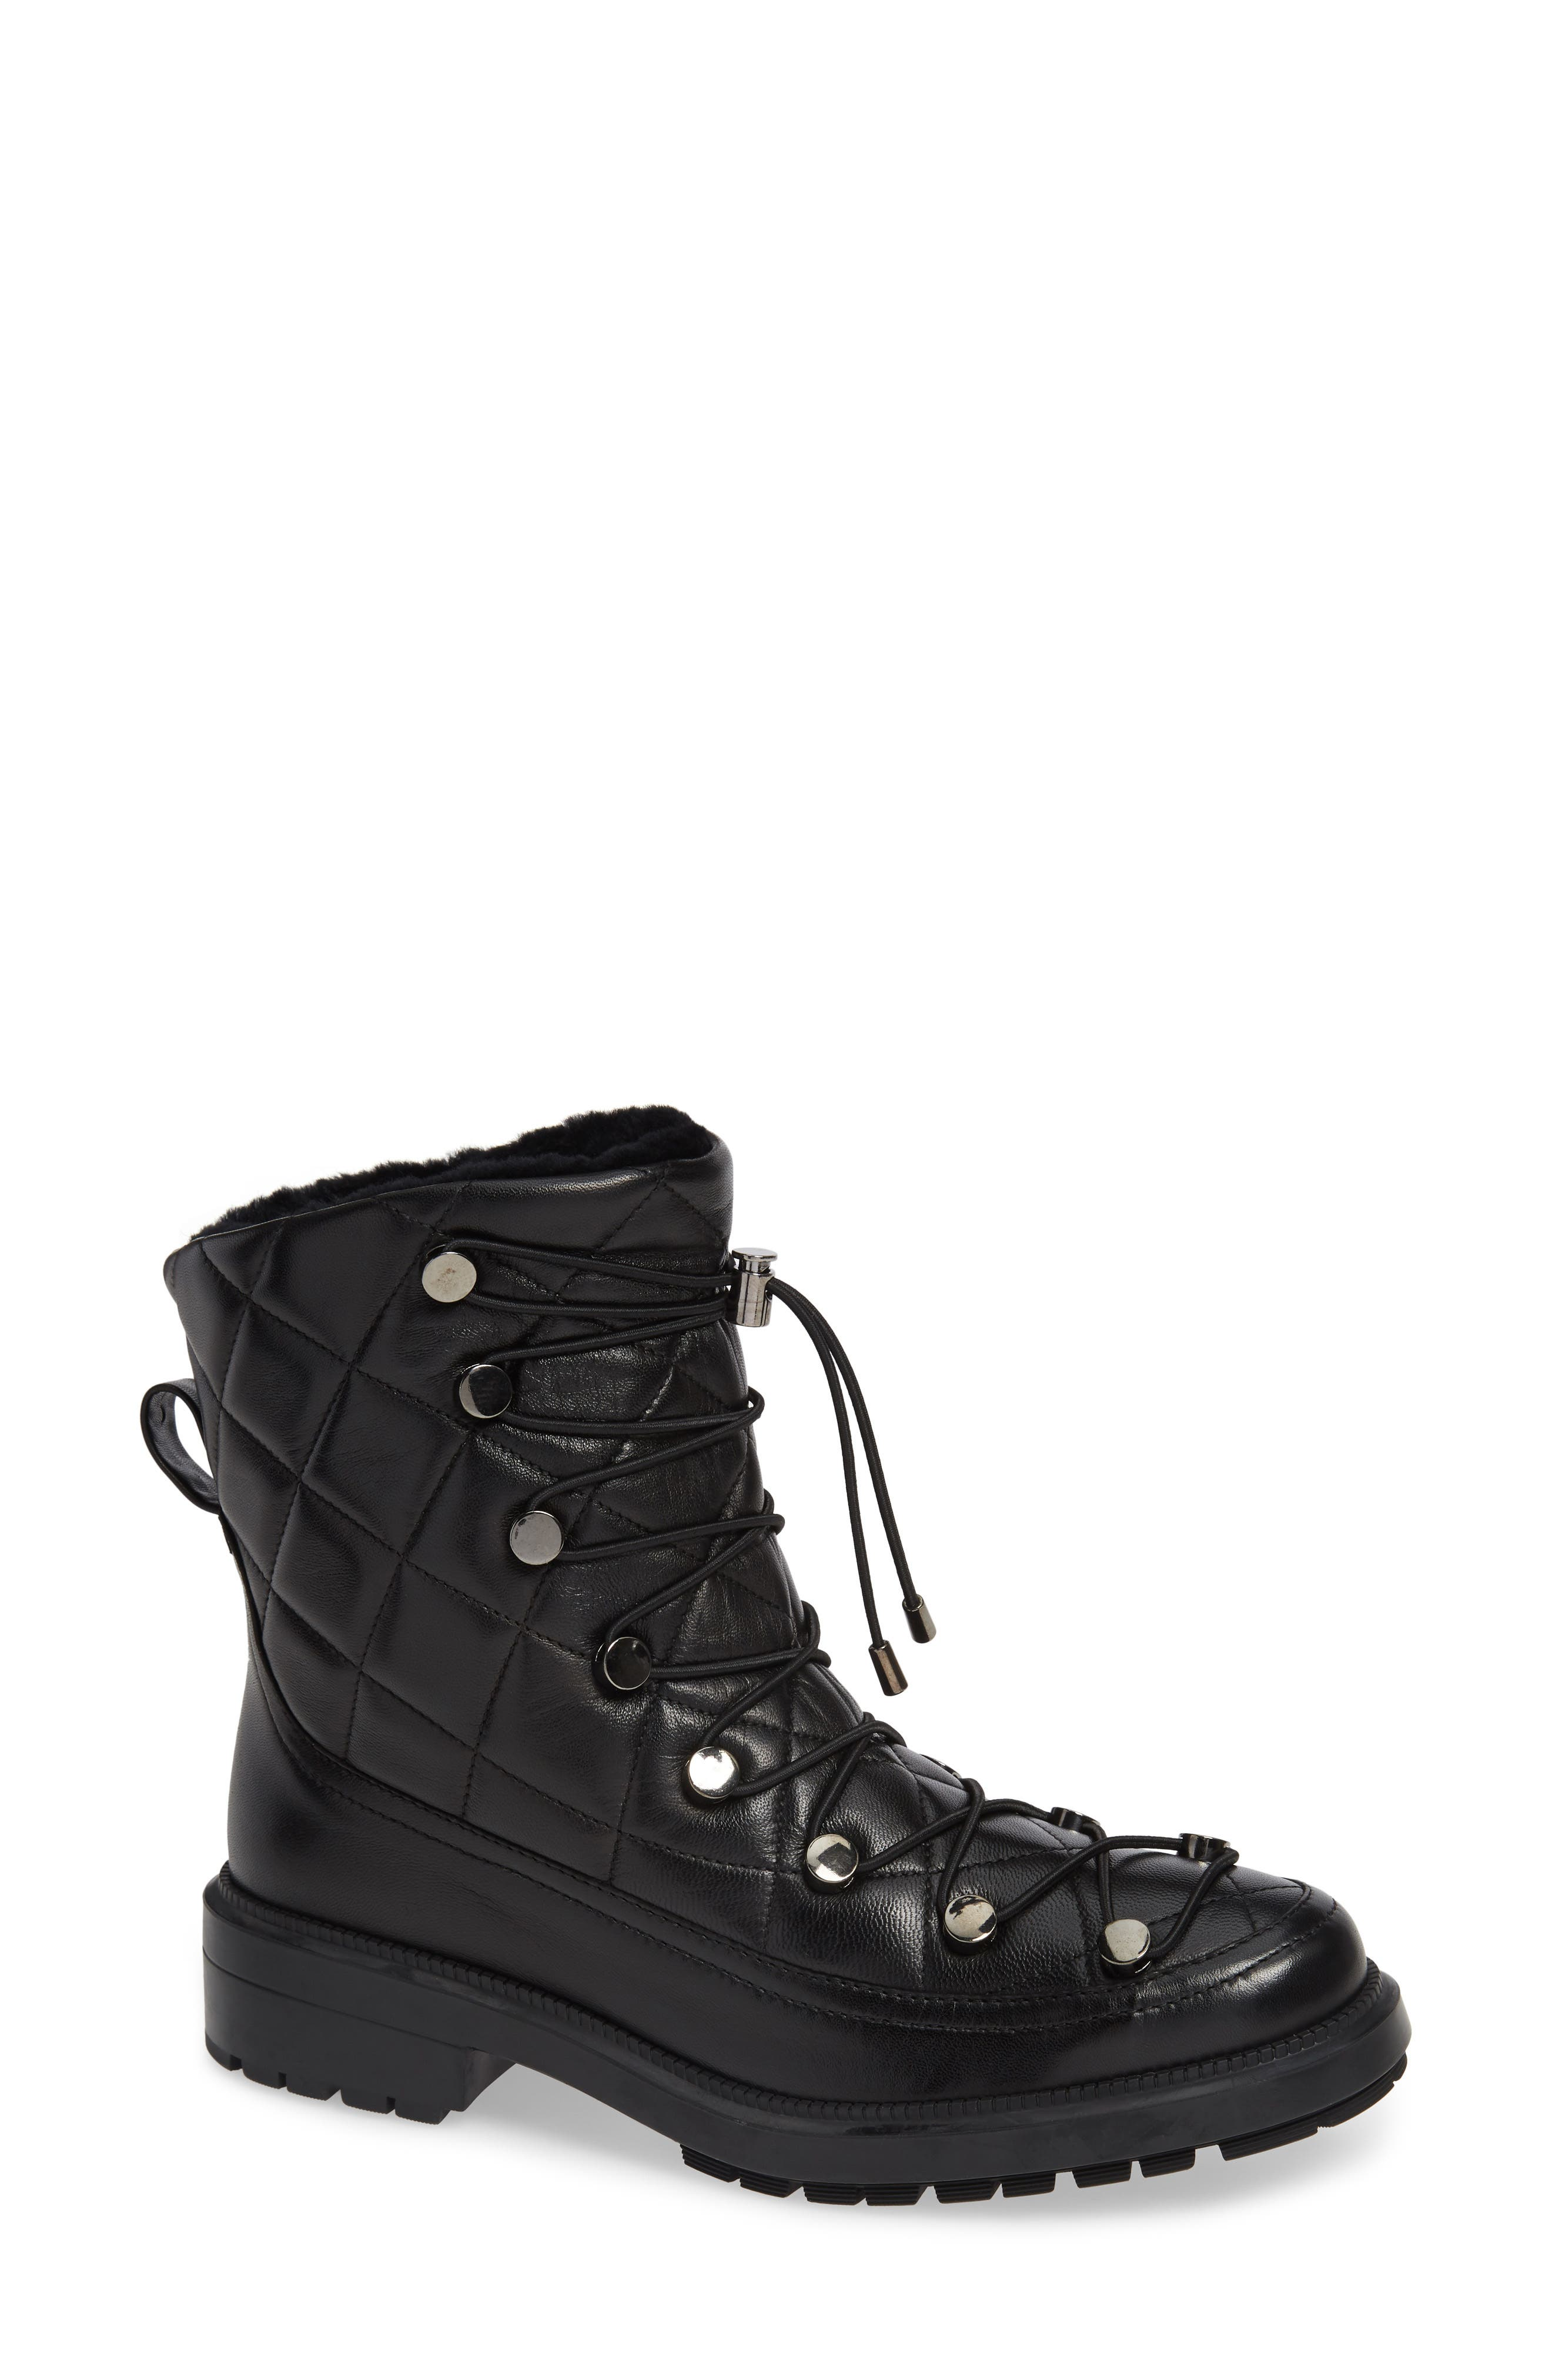 Aquatalia Lorena Genuine Shearling Boot- Black